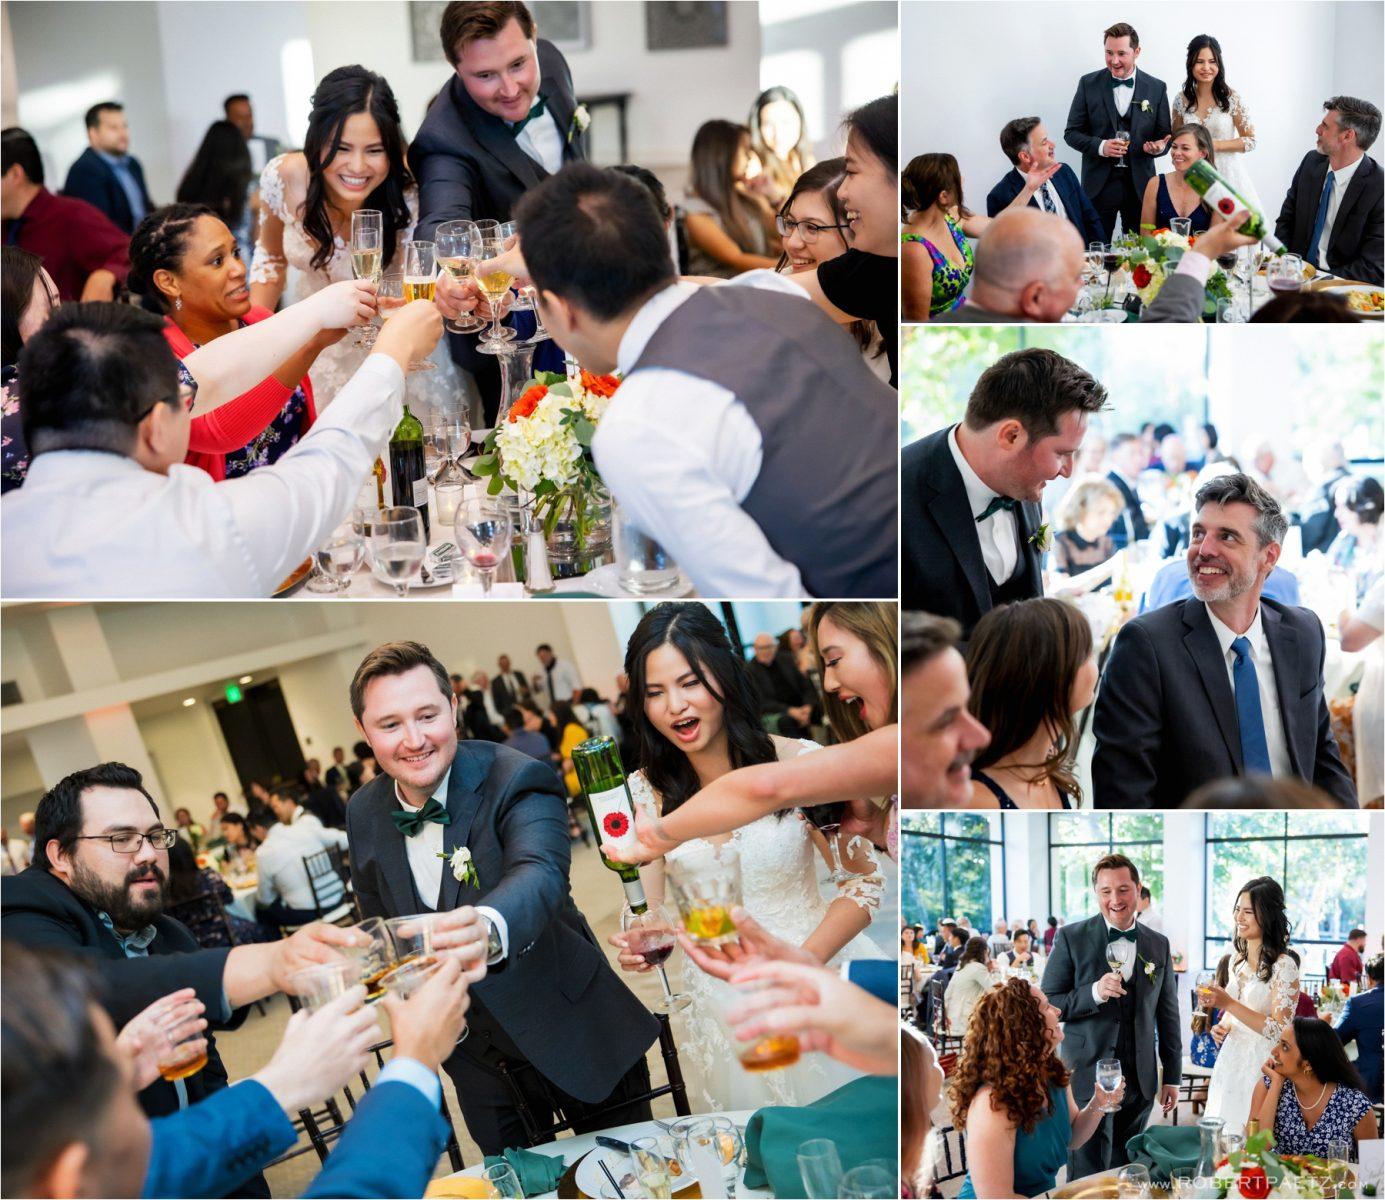 Irvine, UCR, University, Club, Wedding, Photography, Summer, Los Angeles, Photography, Photographer, orange, county, oc